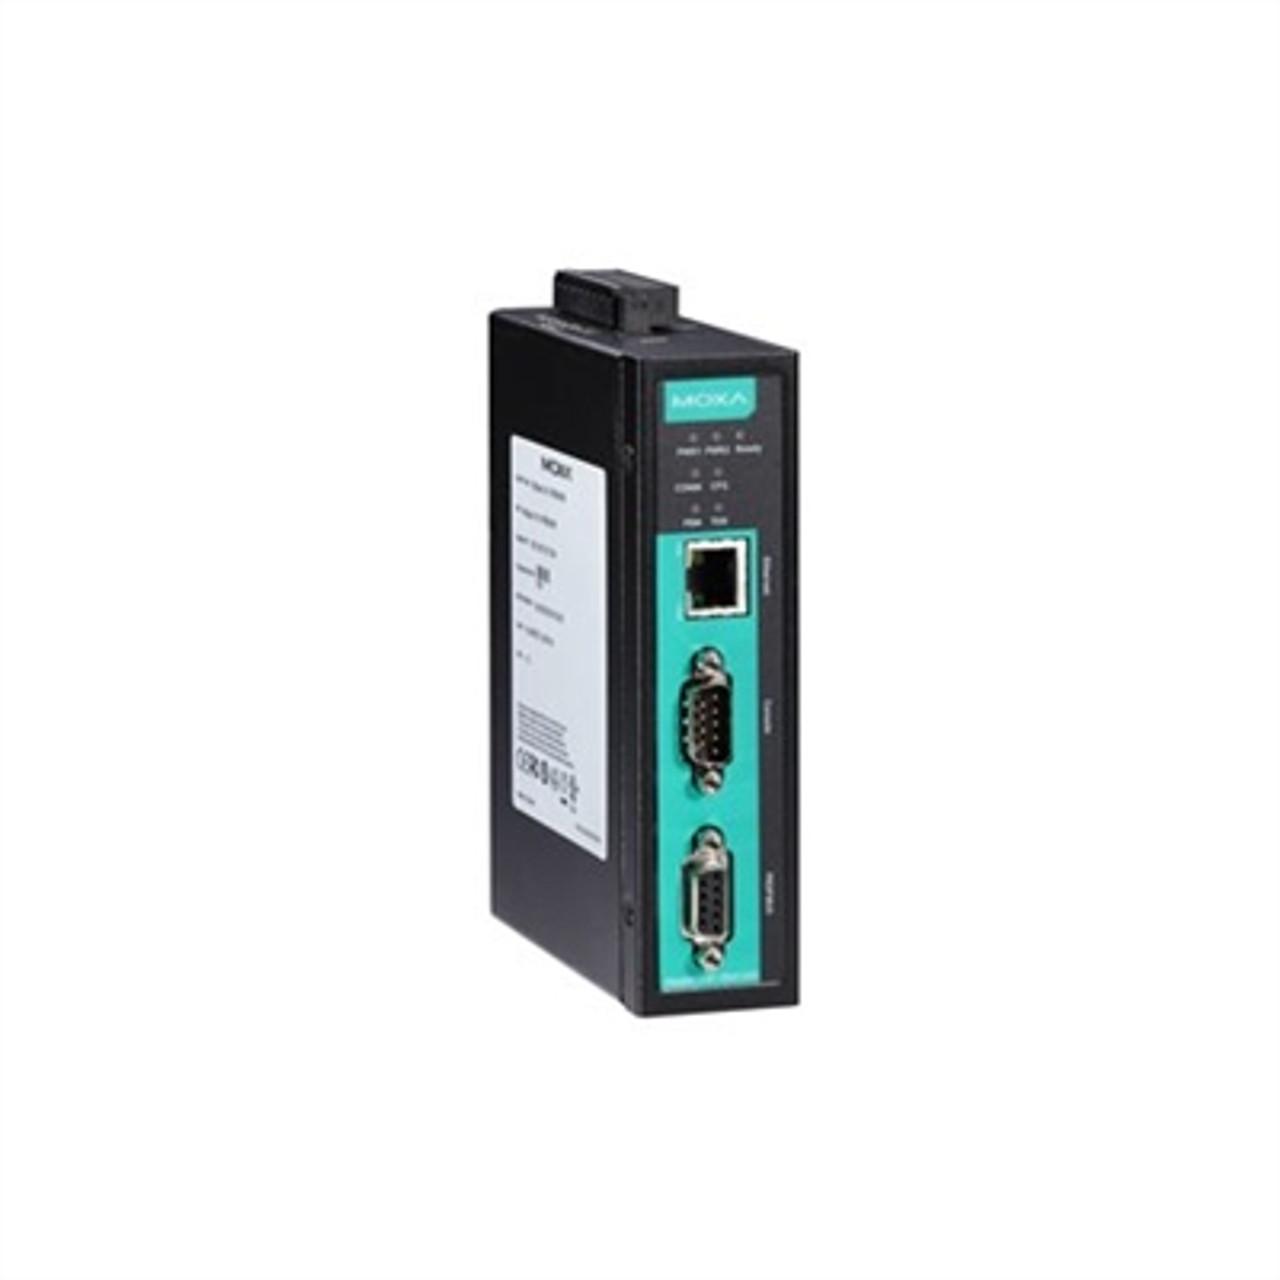 Moxa MGate 5101-PBM-MN 1-Port Profibus Master To Modbus TCP Gateway